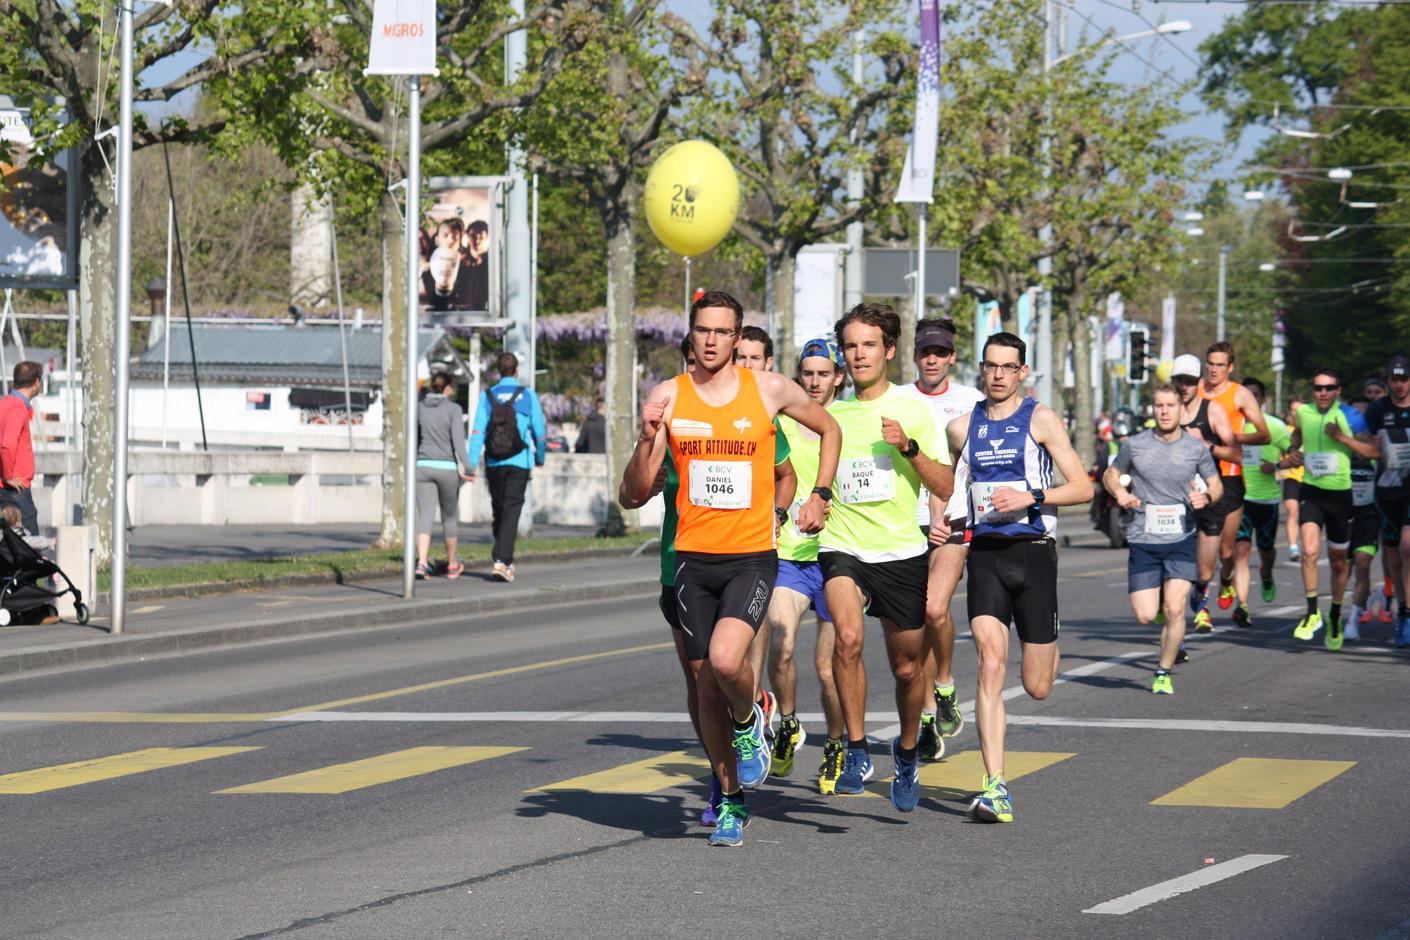 20km Lausanne 2017: Start